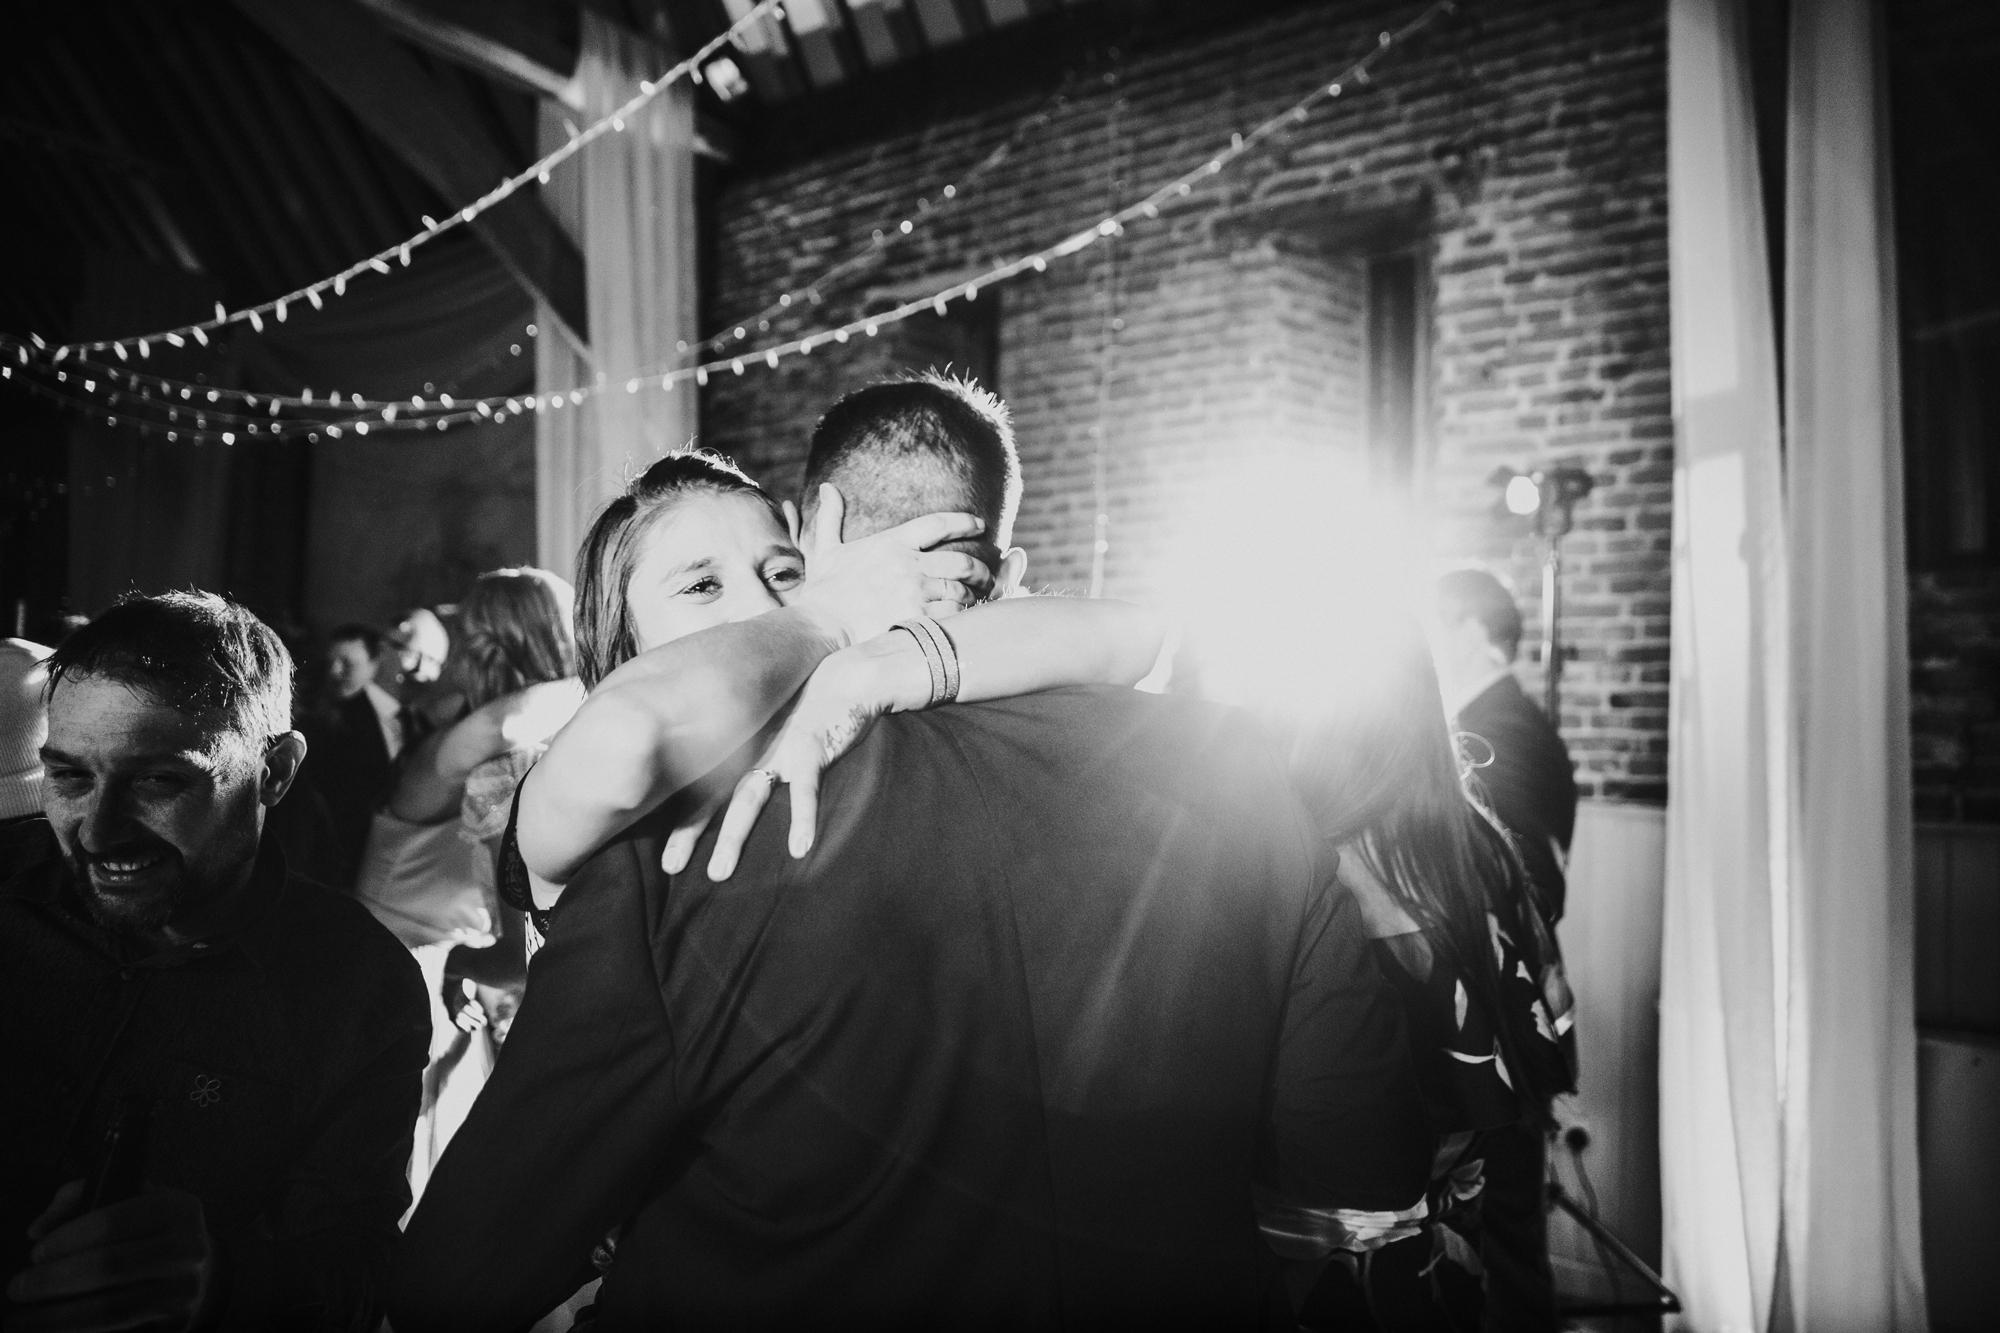 Elms_Barn_Weddings_Suffolk_Photographer_Copyright_Esther_Wild_IMG_3569-2.jpg